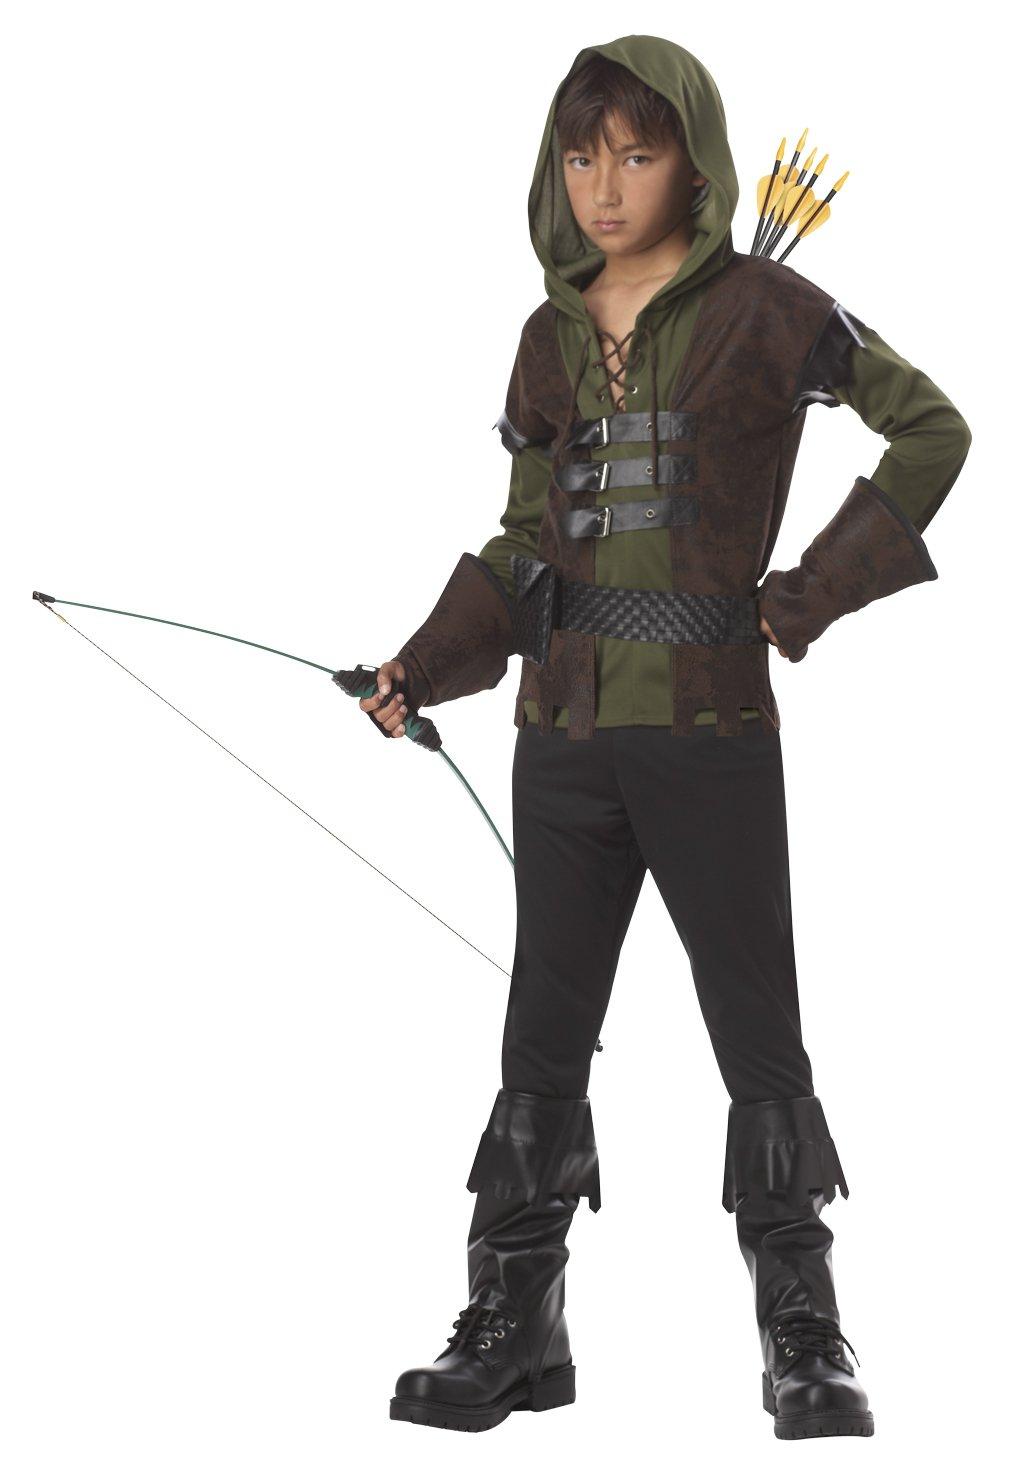 Robin Hood Child Costume Size: Large #00274